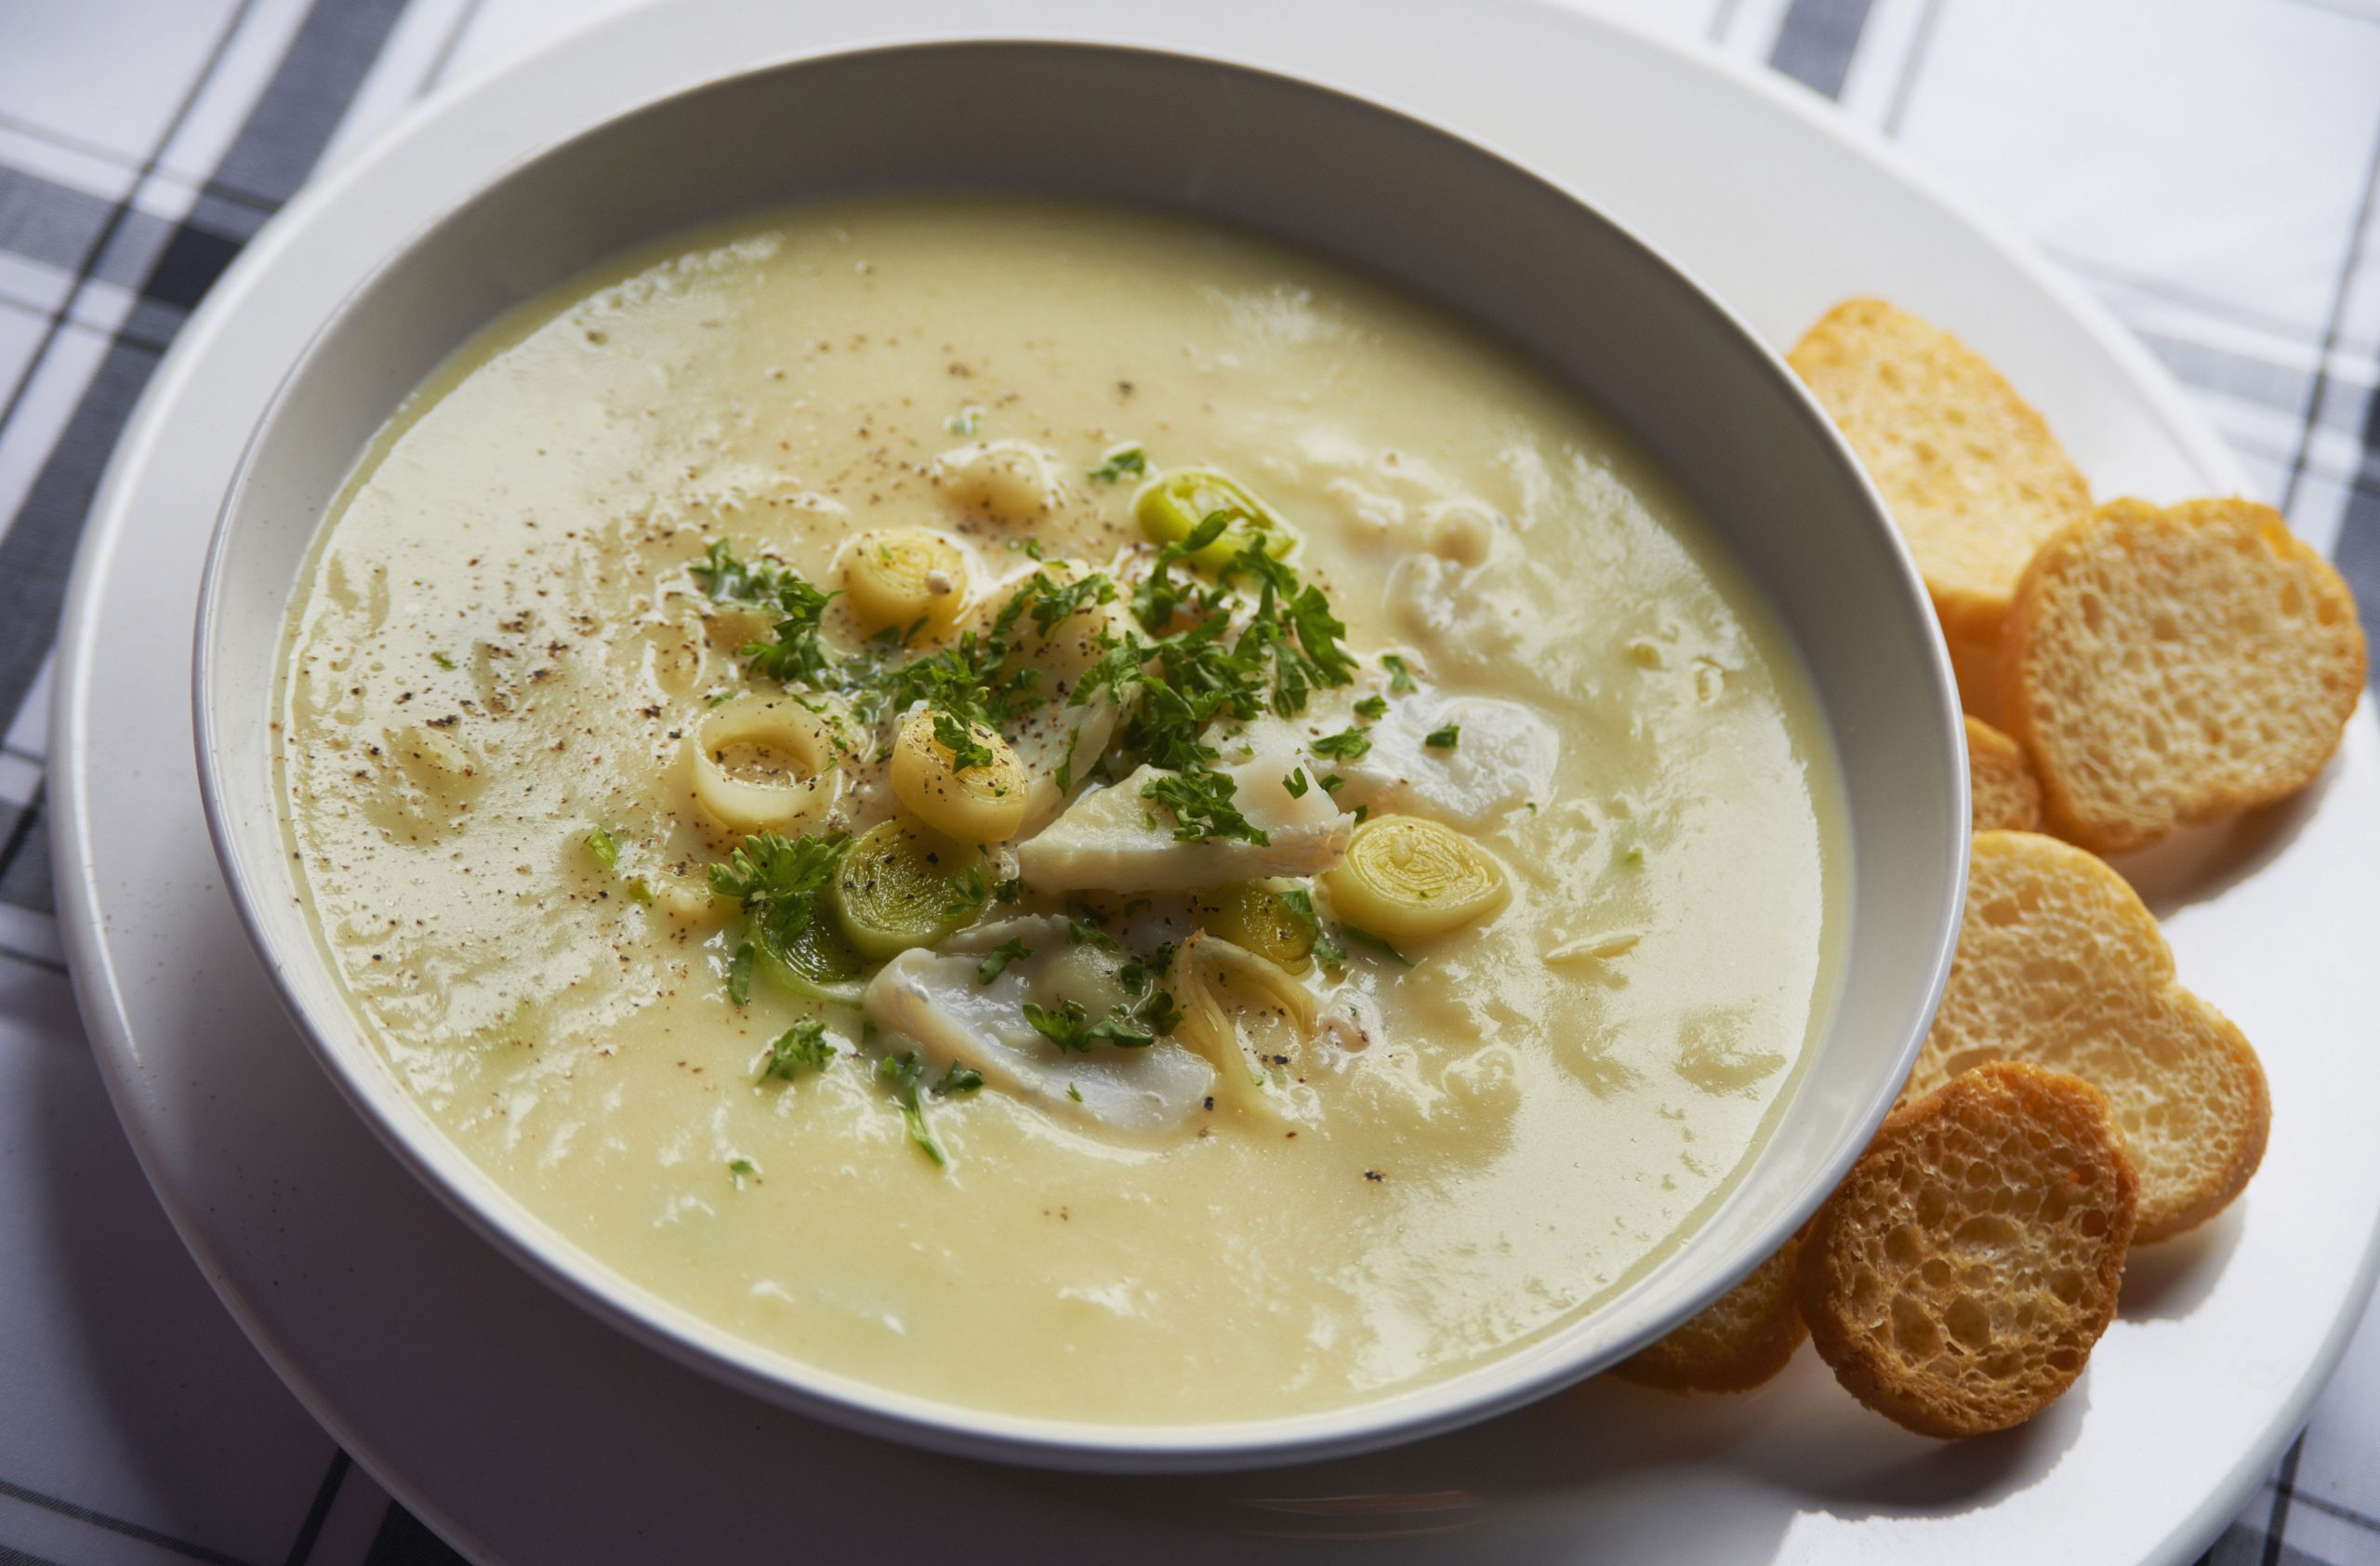 How to make leek and potato soup